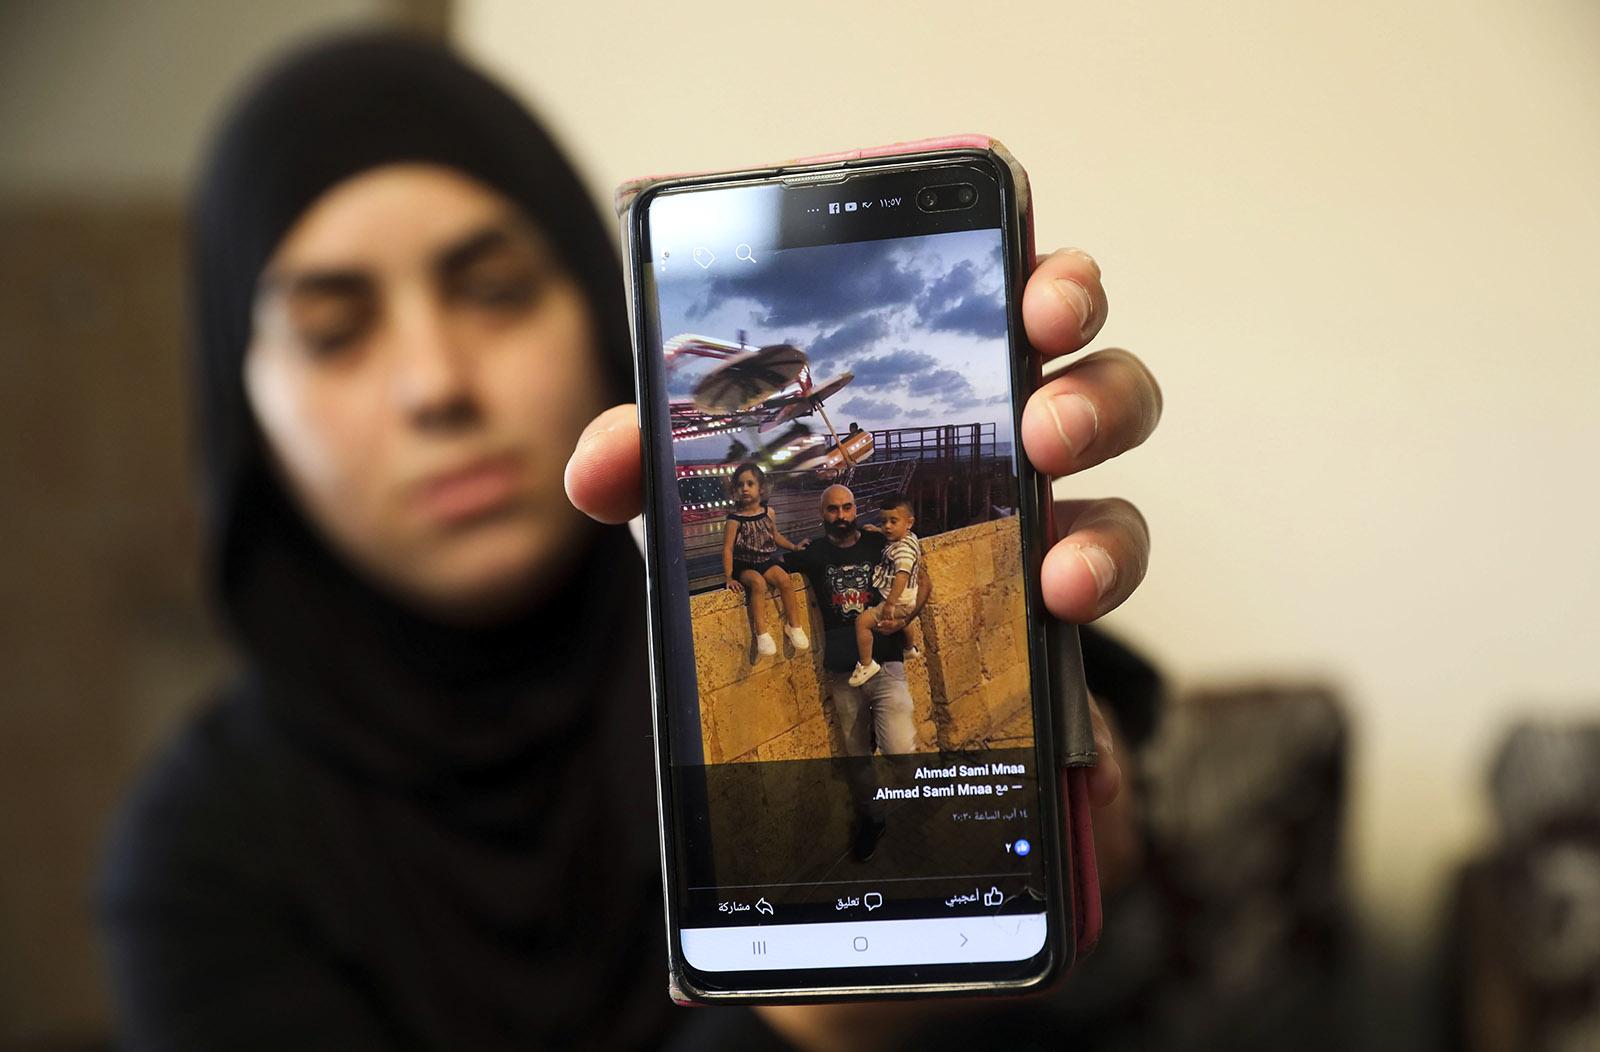 The Gun Violence Epidemic Plaguing Arab-Israeli Society